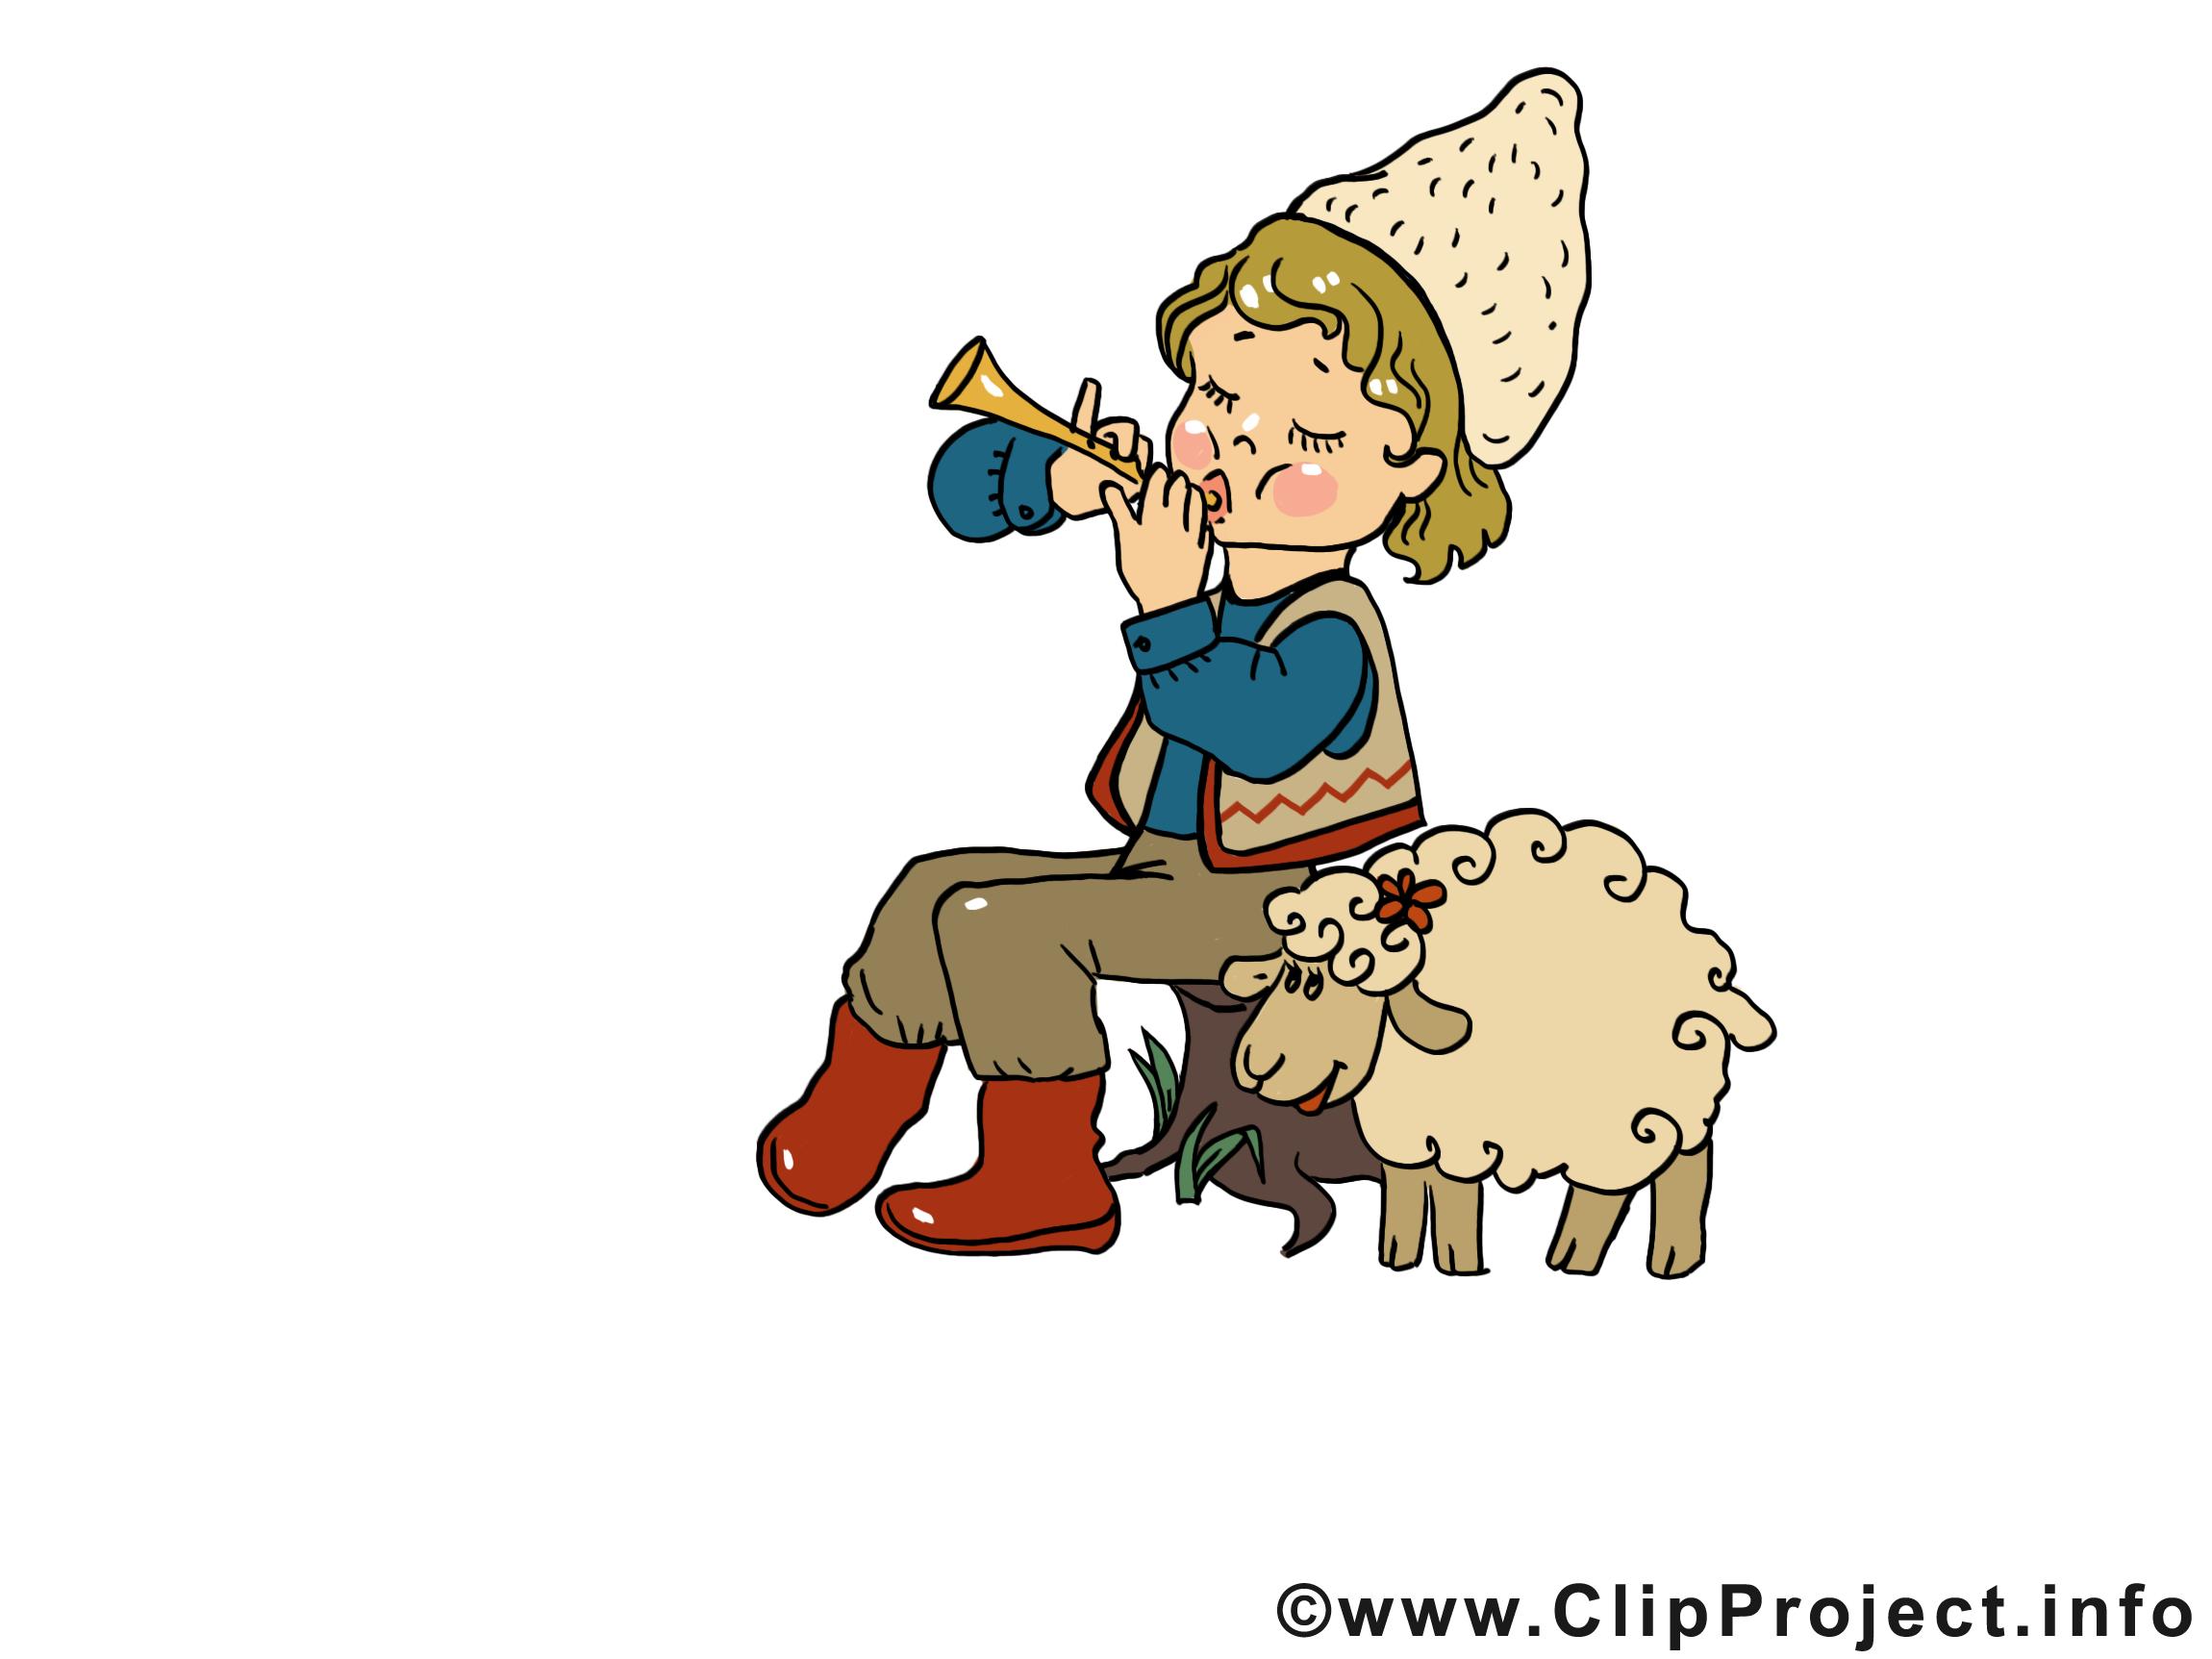 Der gute hirte clipart clip free download Clipart Hirte mit Schaf clip free download